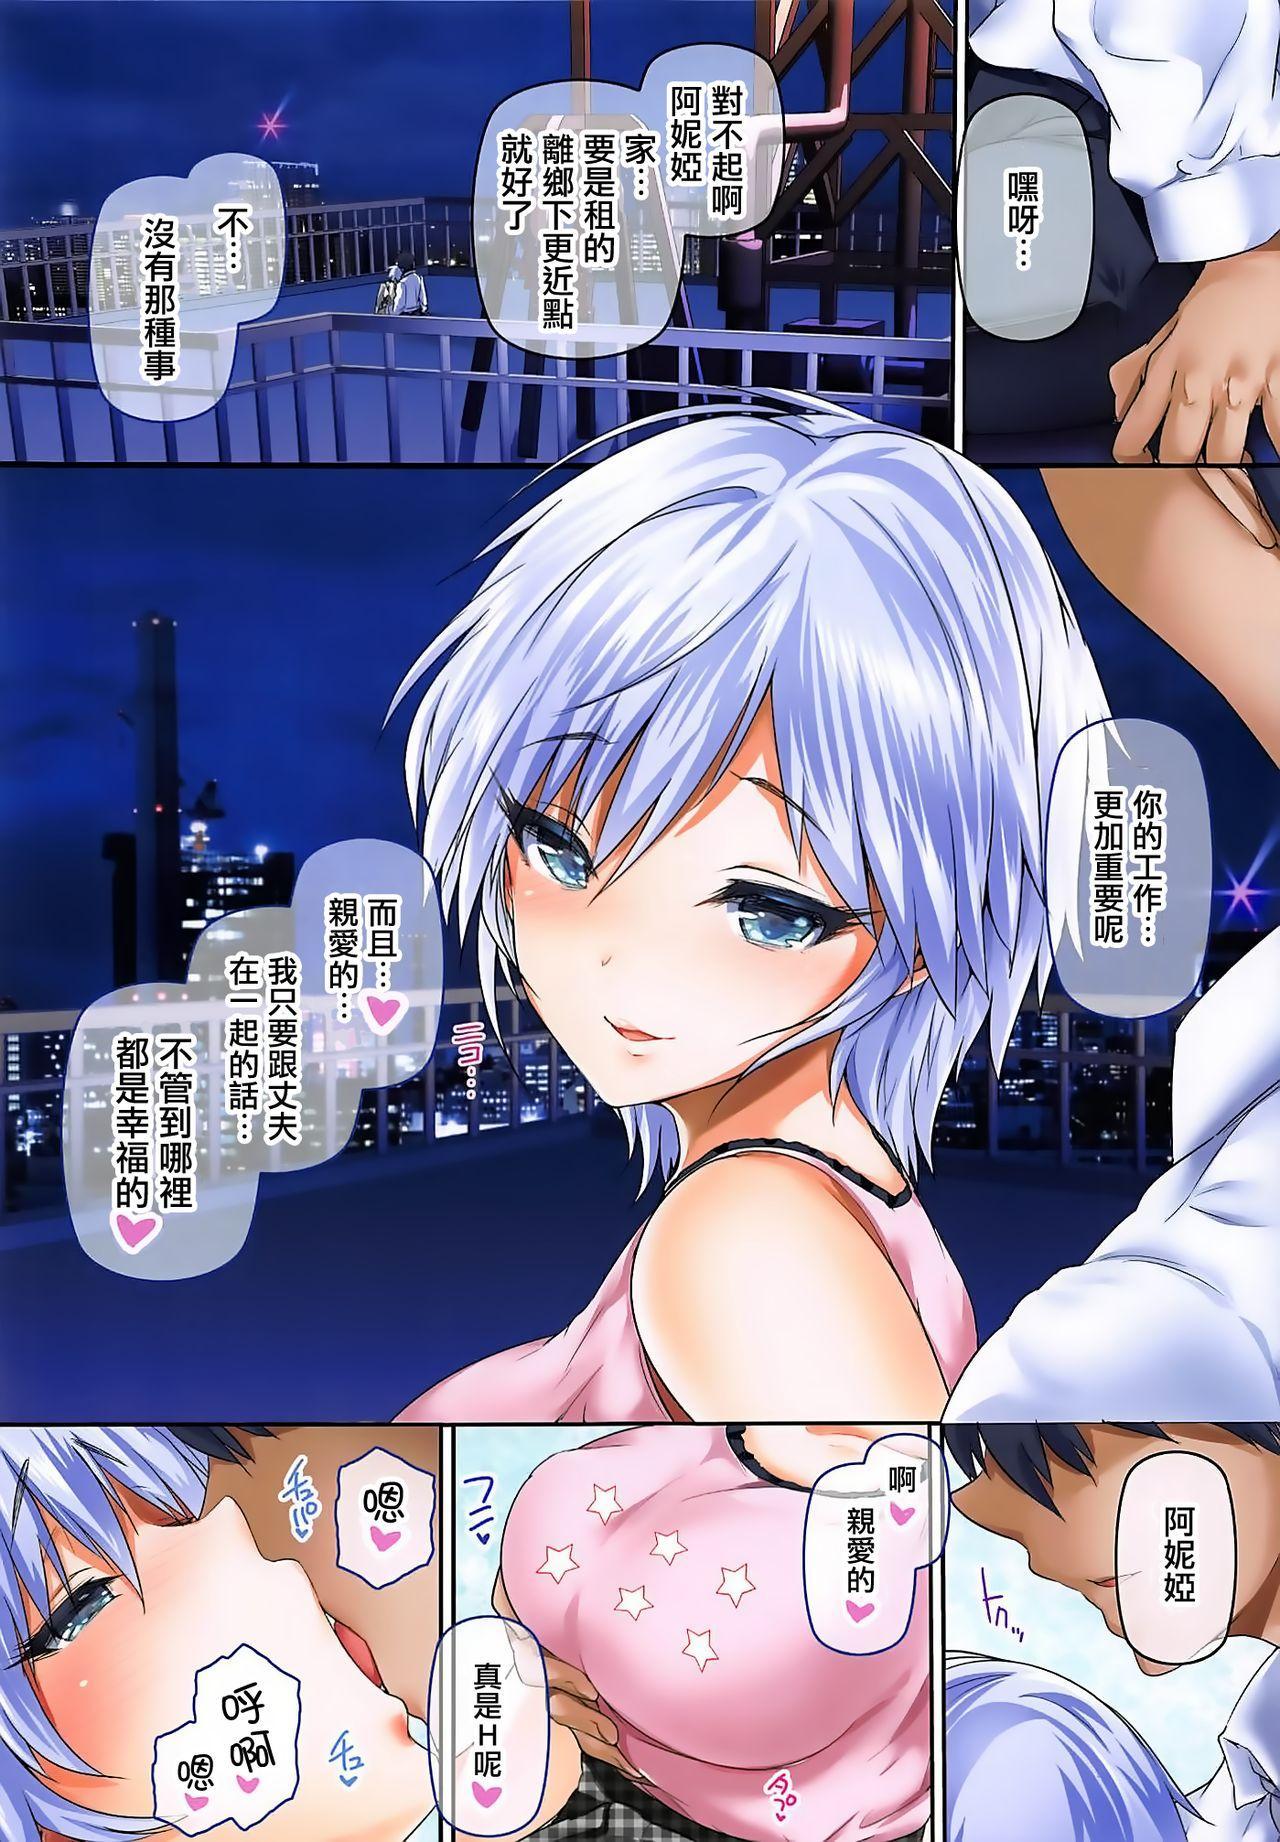 (COMIC1☆11) [Atelier Maruwa (Maruwa Tarou)] Oku-sama wa iDOLS -Wives of CINDERELLA2- (THE IDOLM@STER CINDERELLA GIRLS) [Chinese] [寂月汉化组] 14